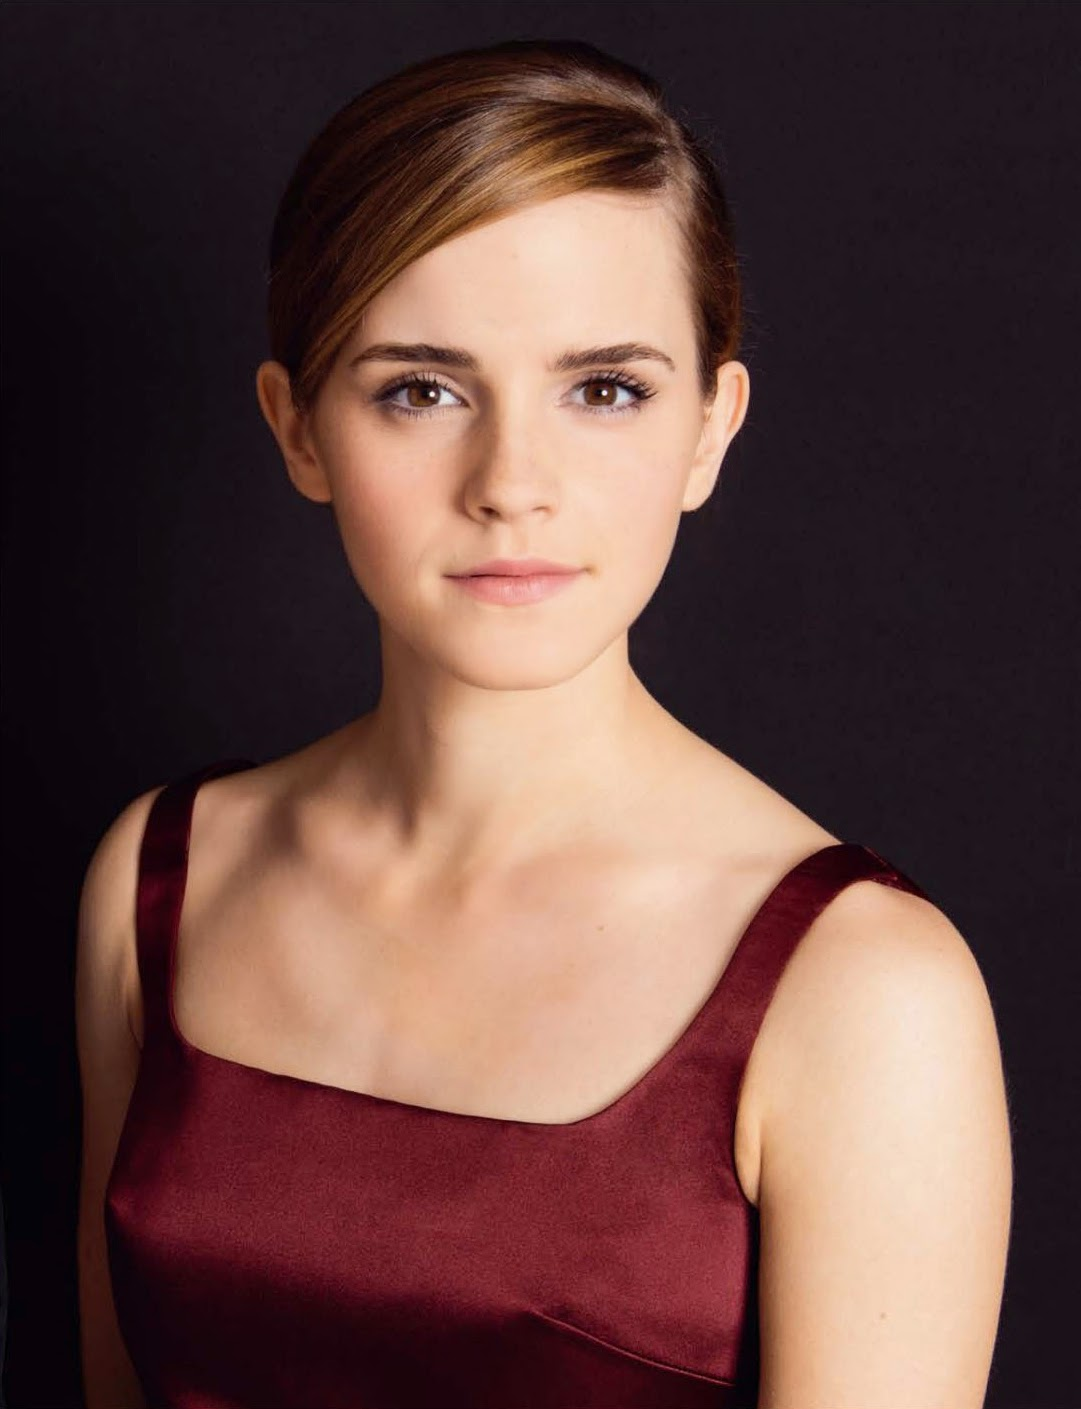 @@@@@@site:.cahtpage.com[[@@@]@] 956x1440 Filename: Emma_Watson-les_Inrockuptibles-magazine_11_June_2013.jpg